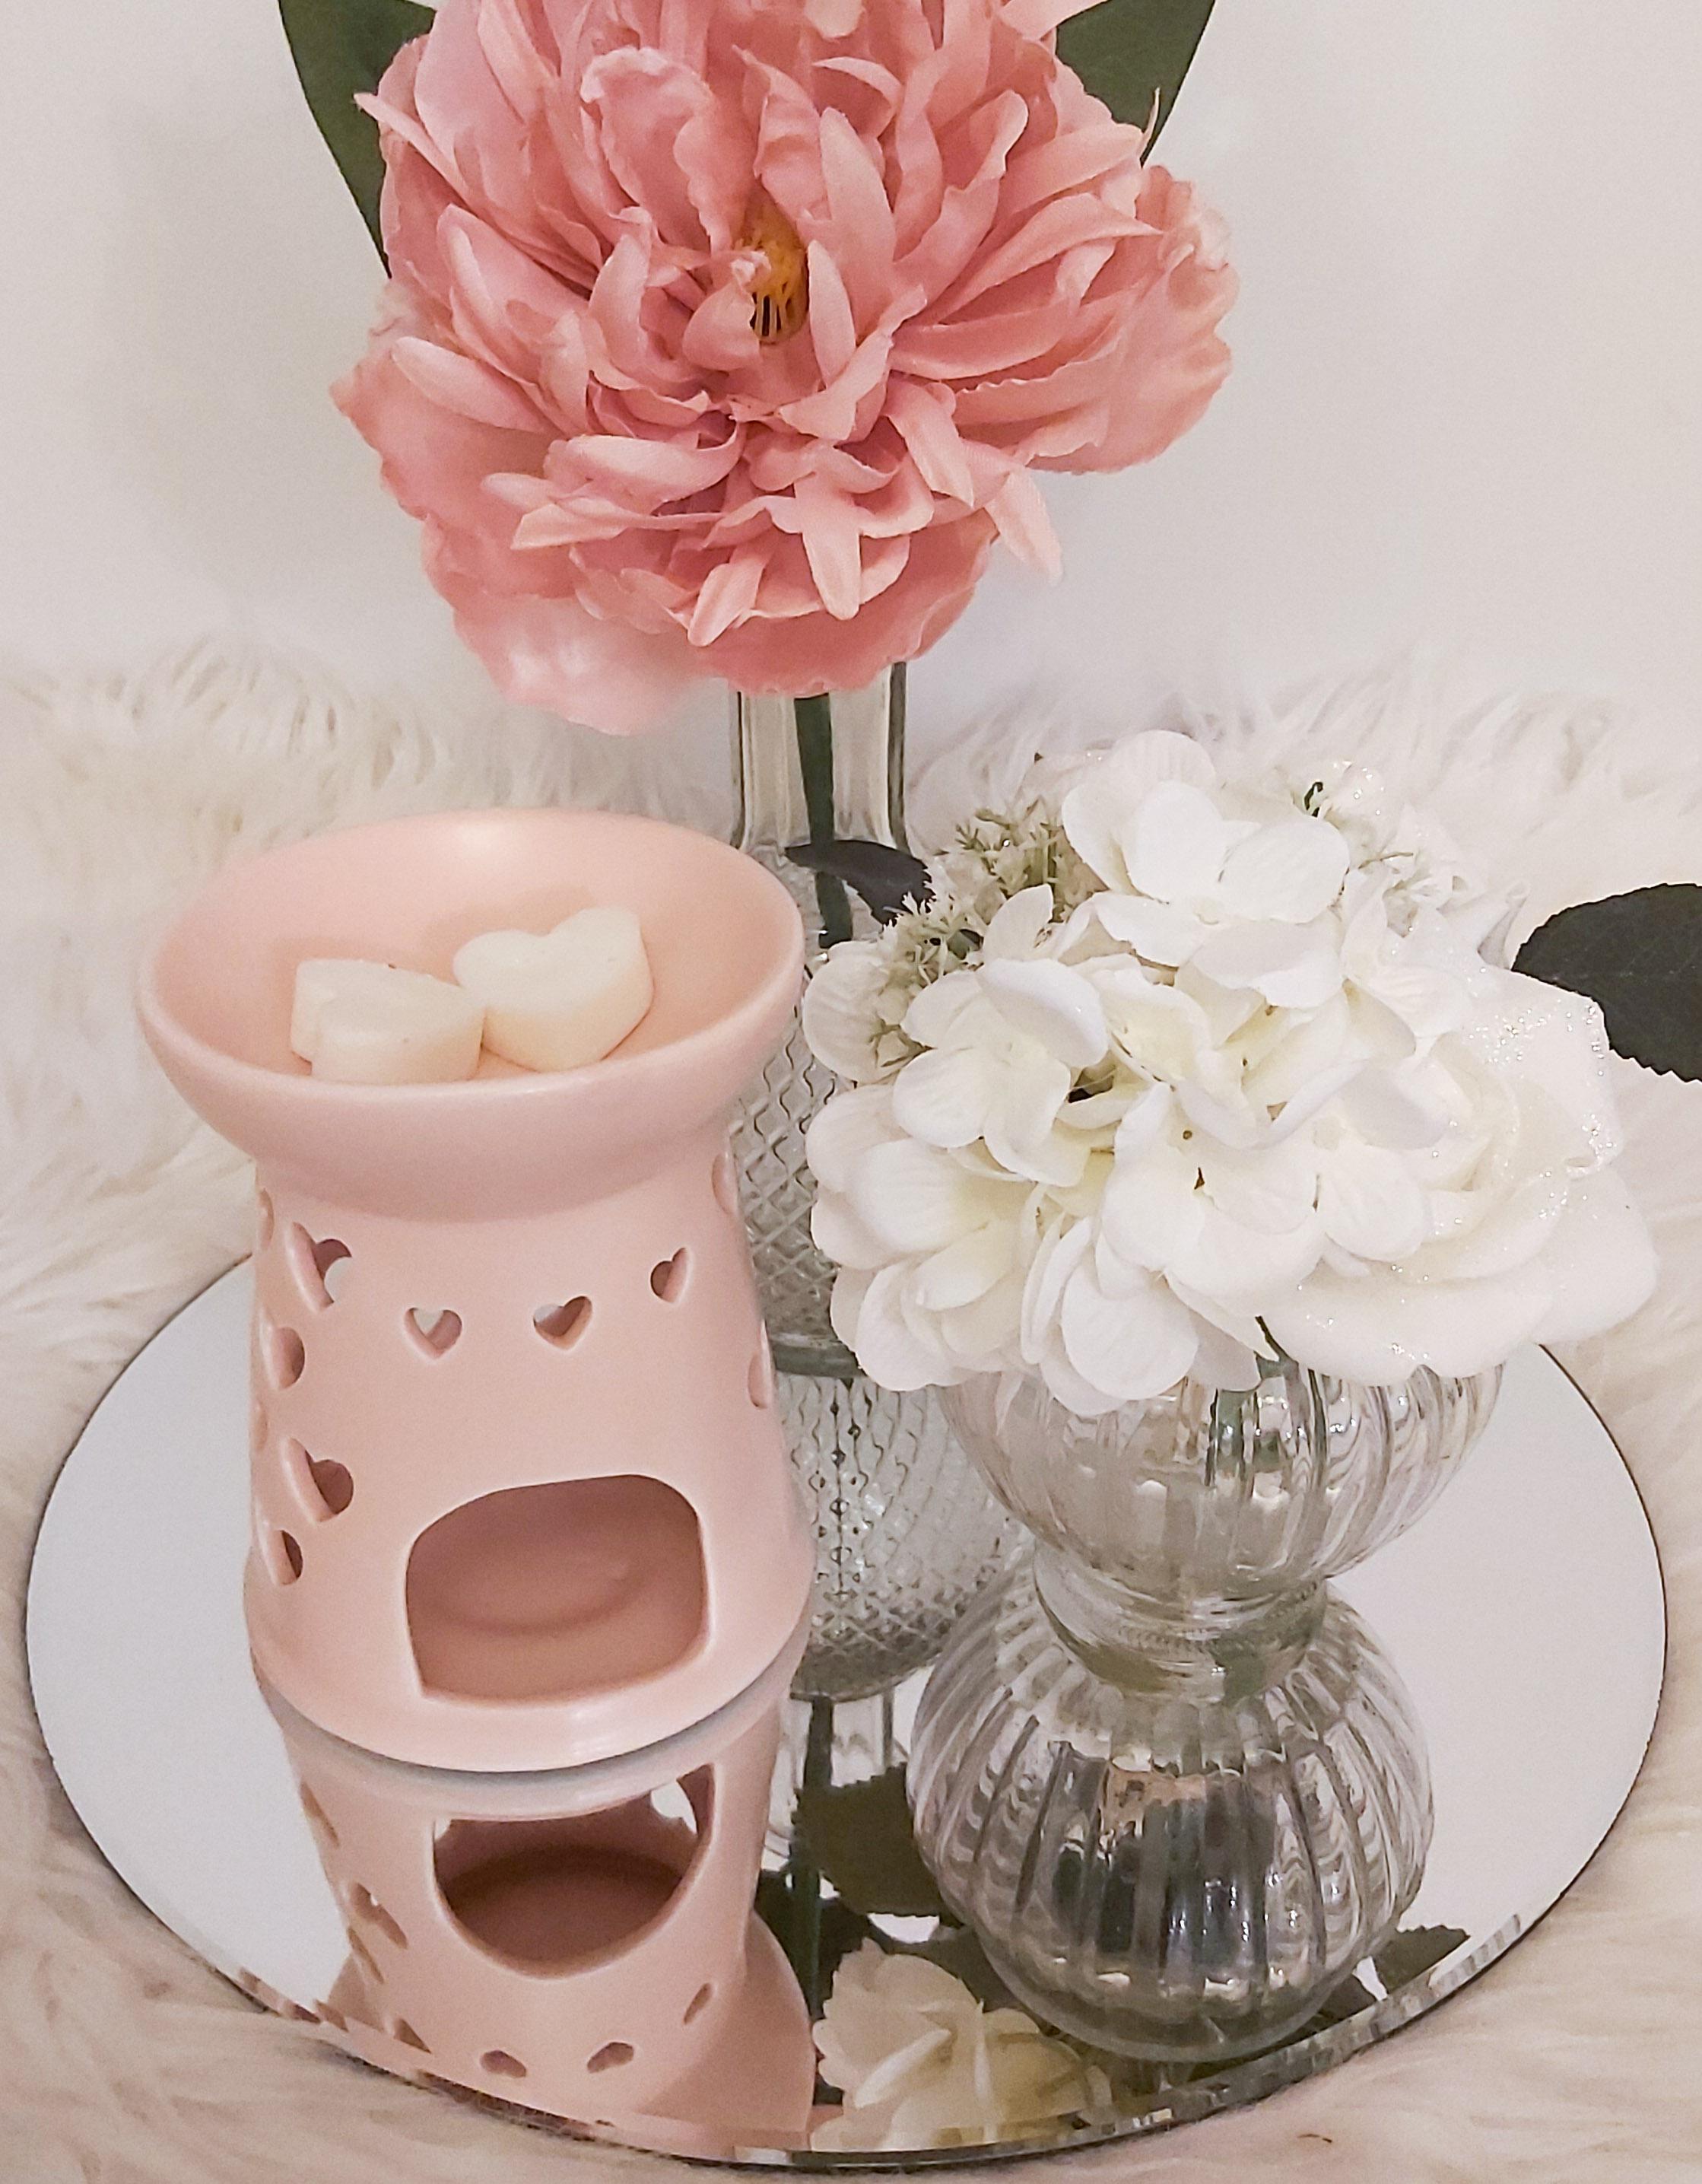 Blush Pink Heart Burner